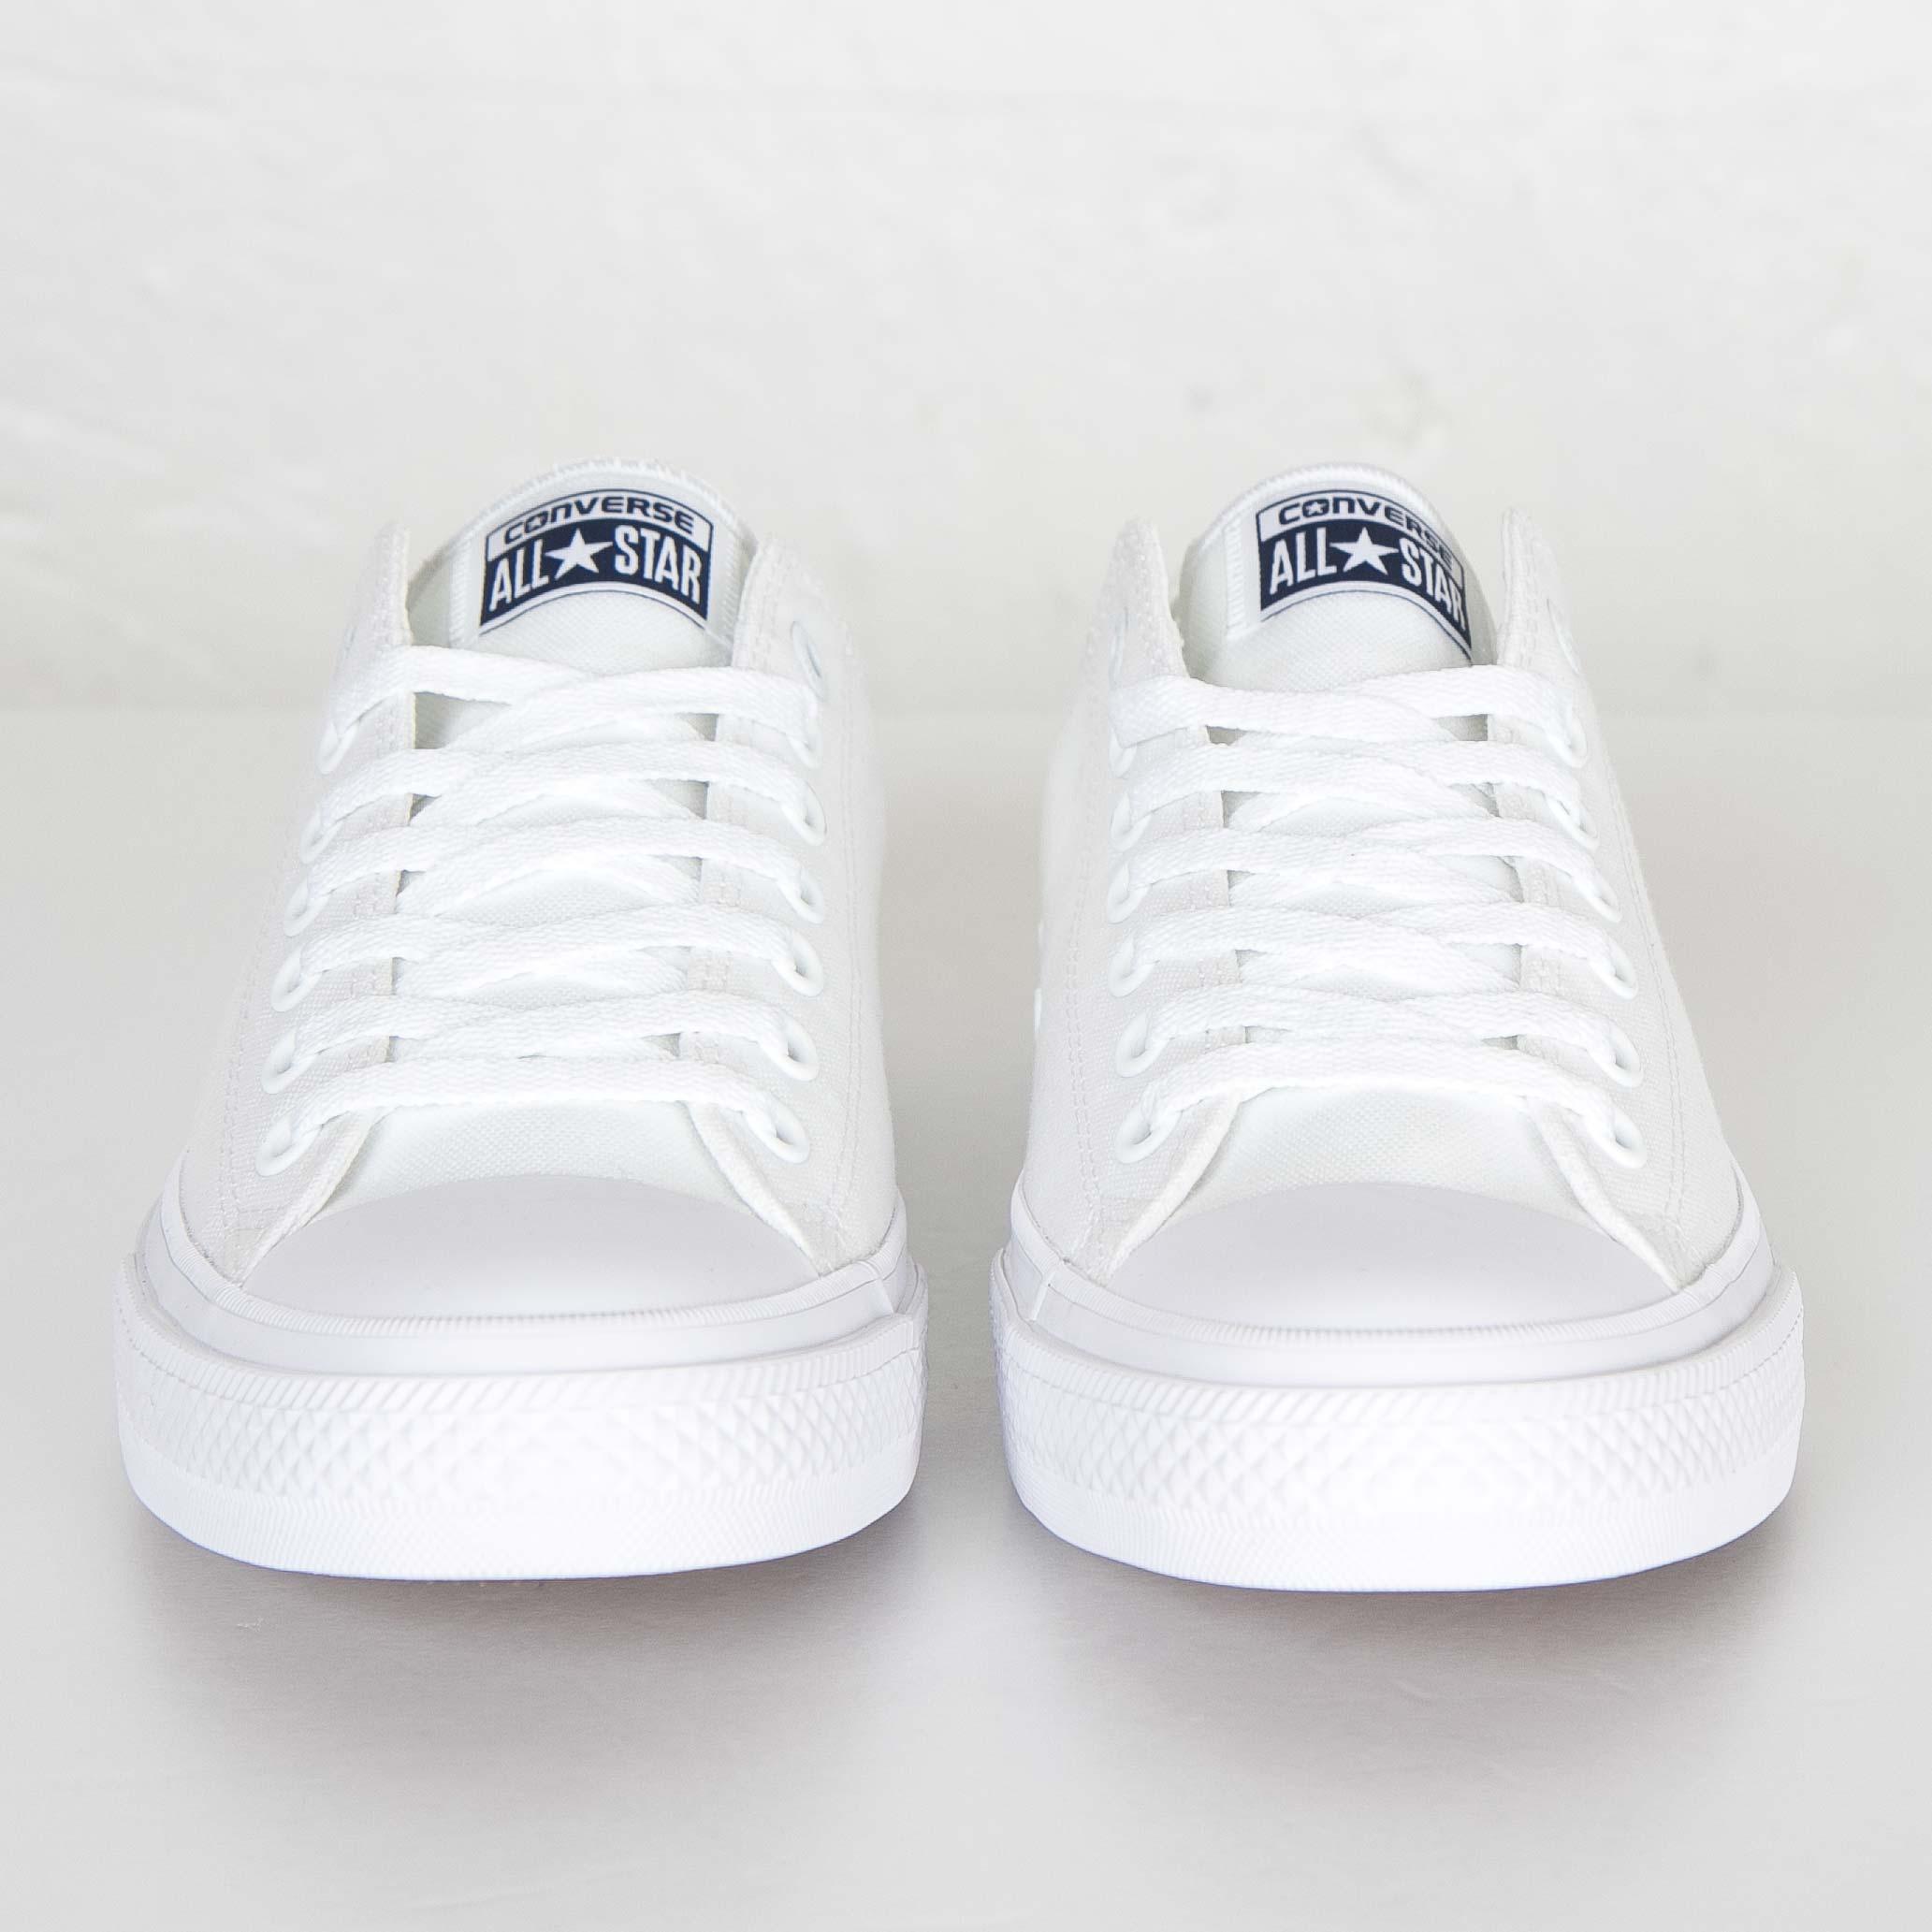 eb57af75109e Converse Chuck Taylor II Ox - 150154c - Sneakersnstuff